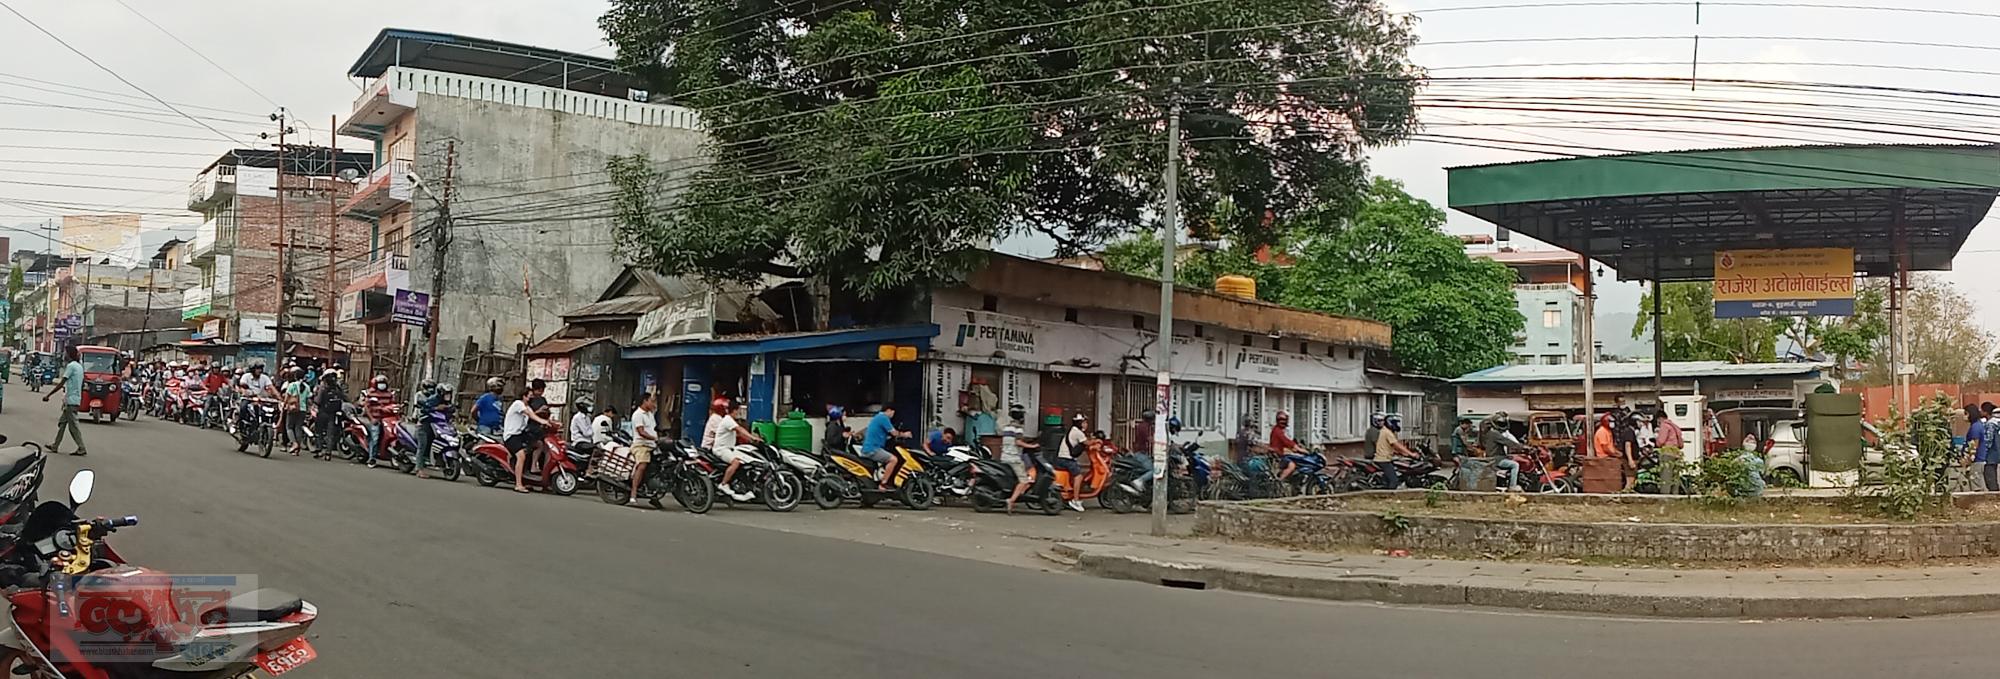 Petrol_Line_dharan 1